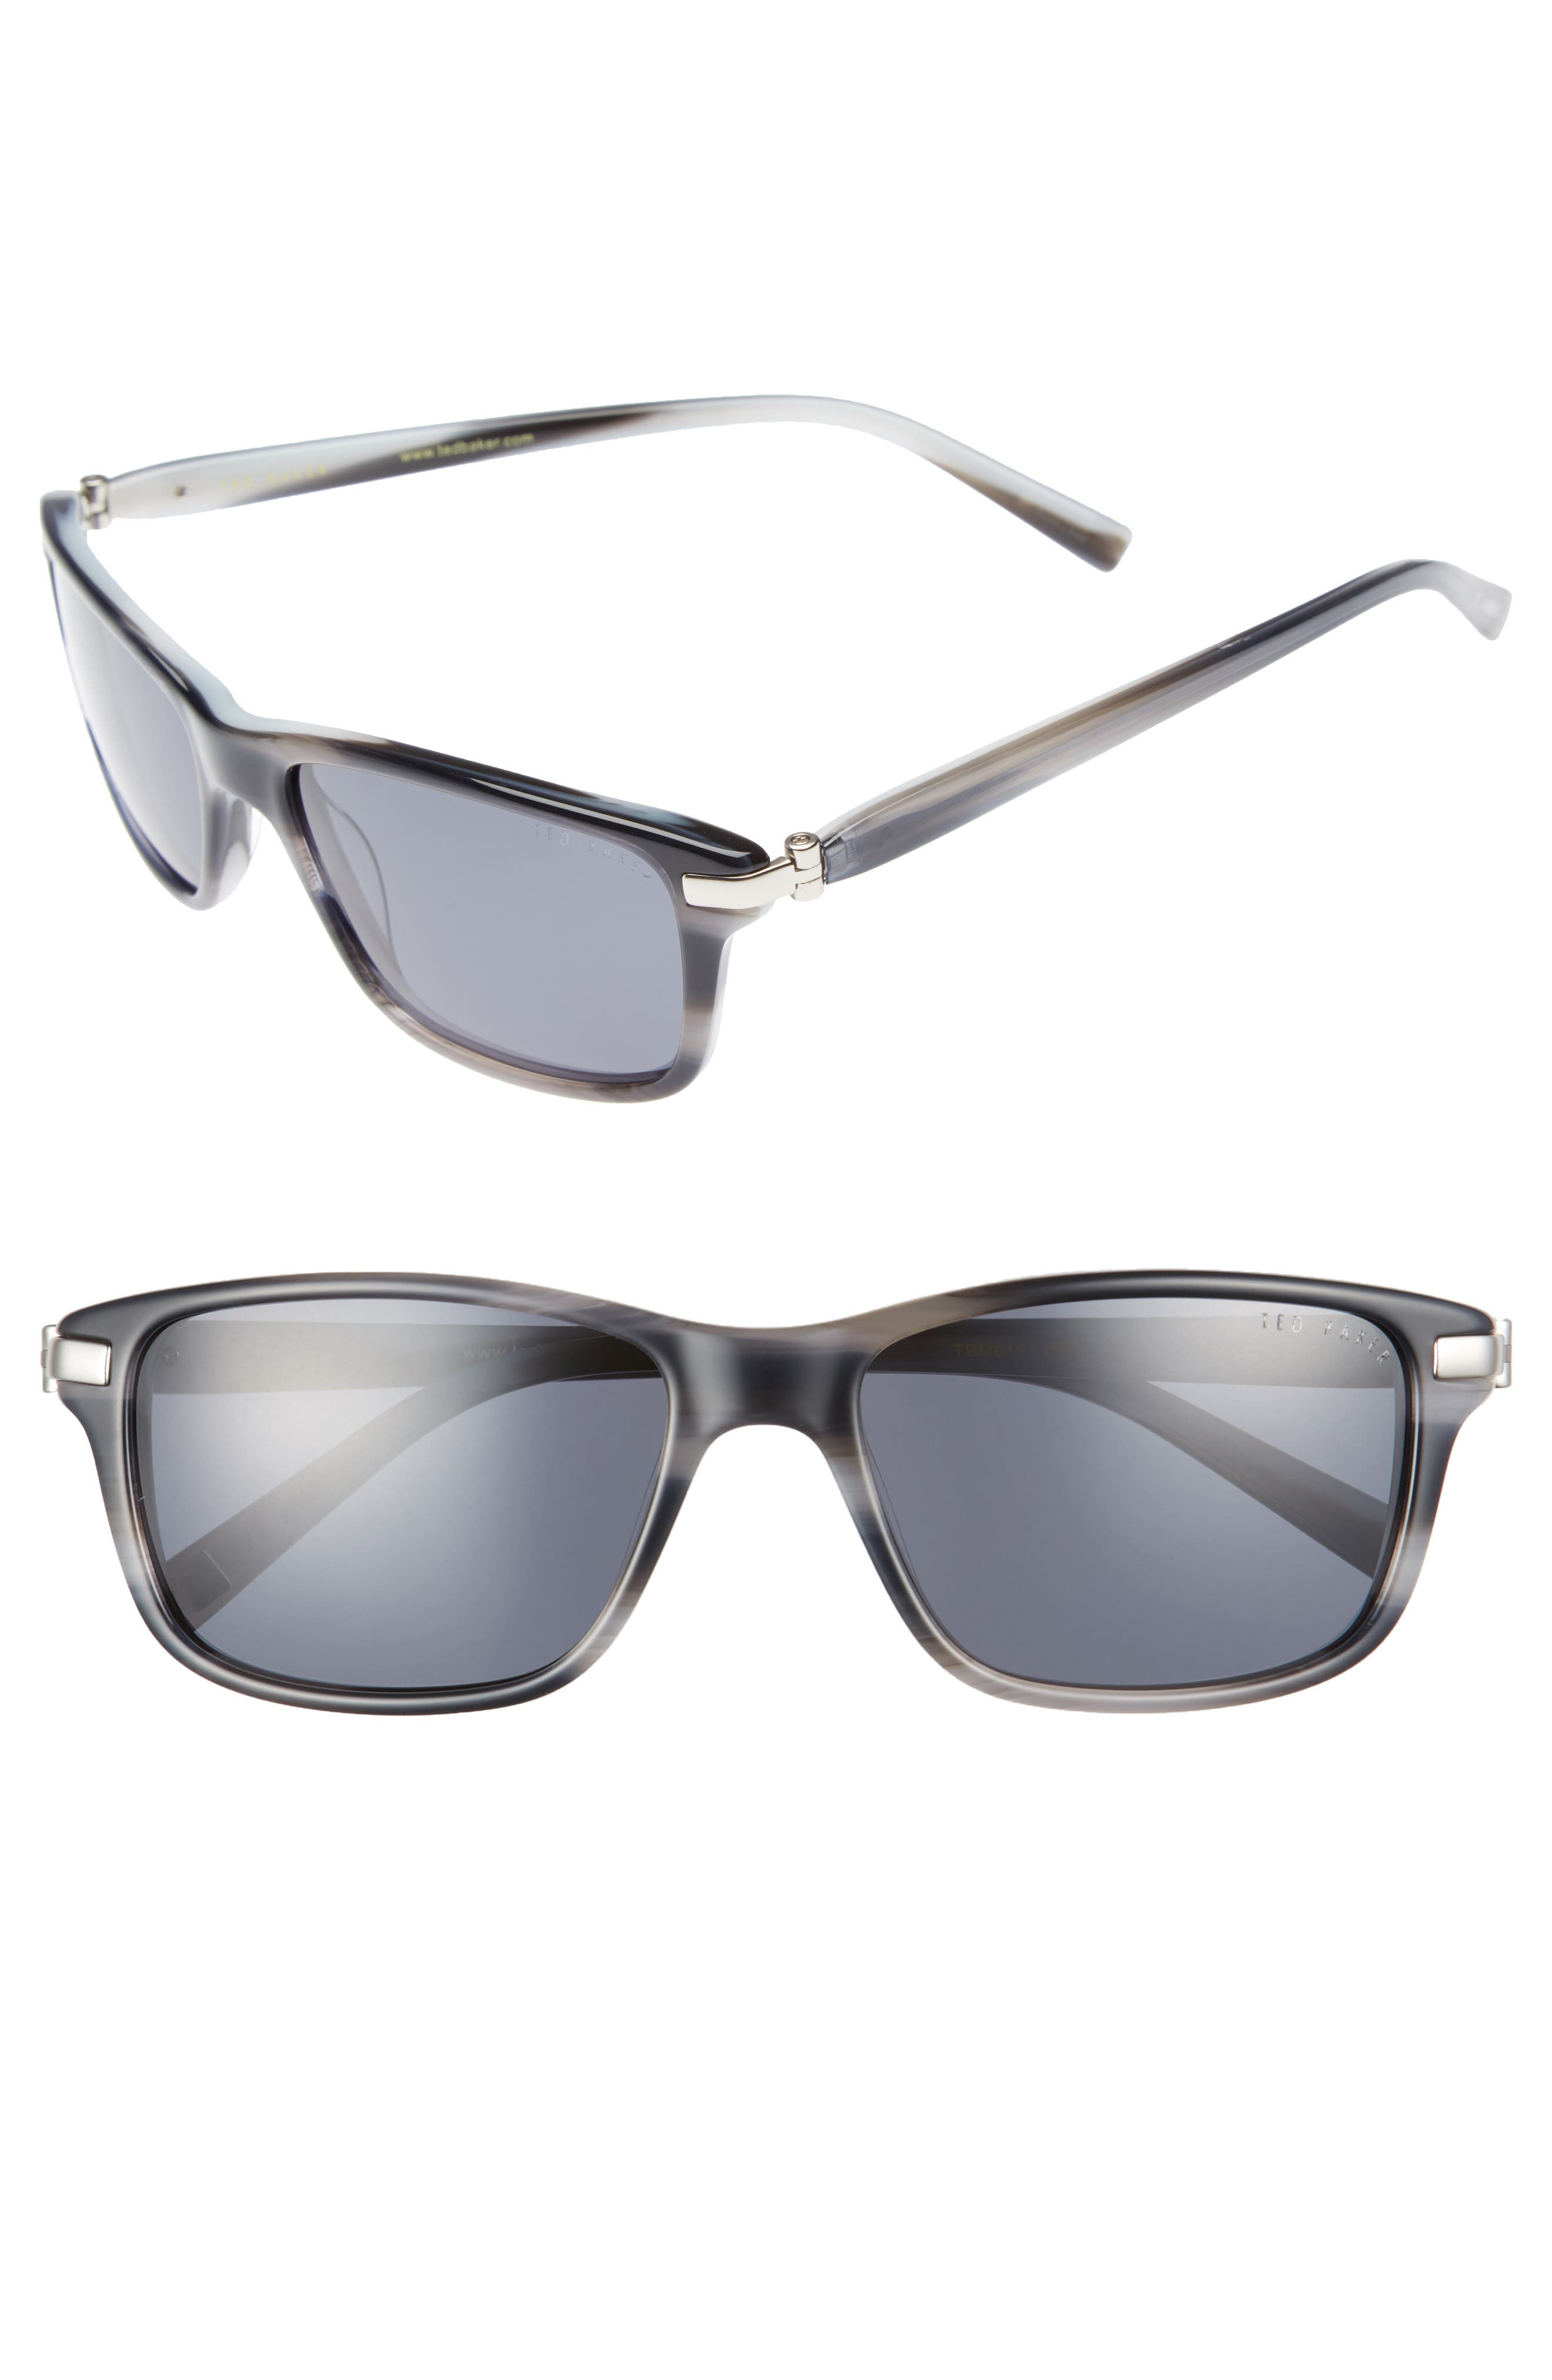 55mm Polarized Sunglasses,                             Main thumbnail 1, color,                             Grey